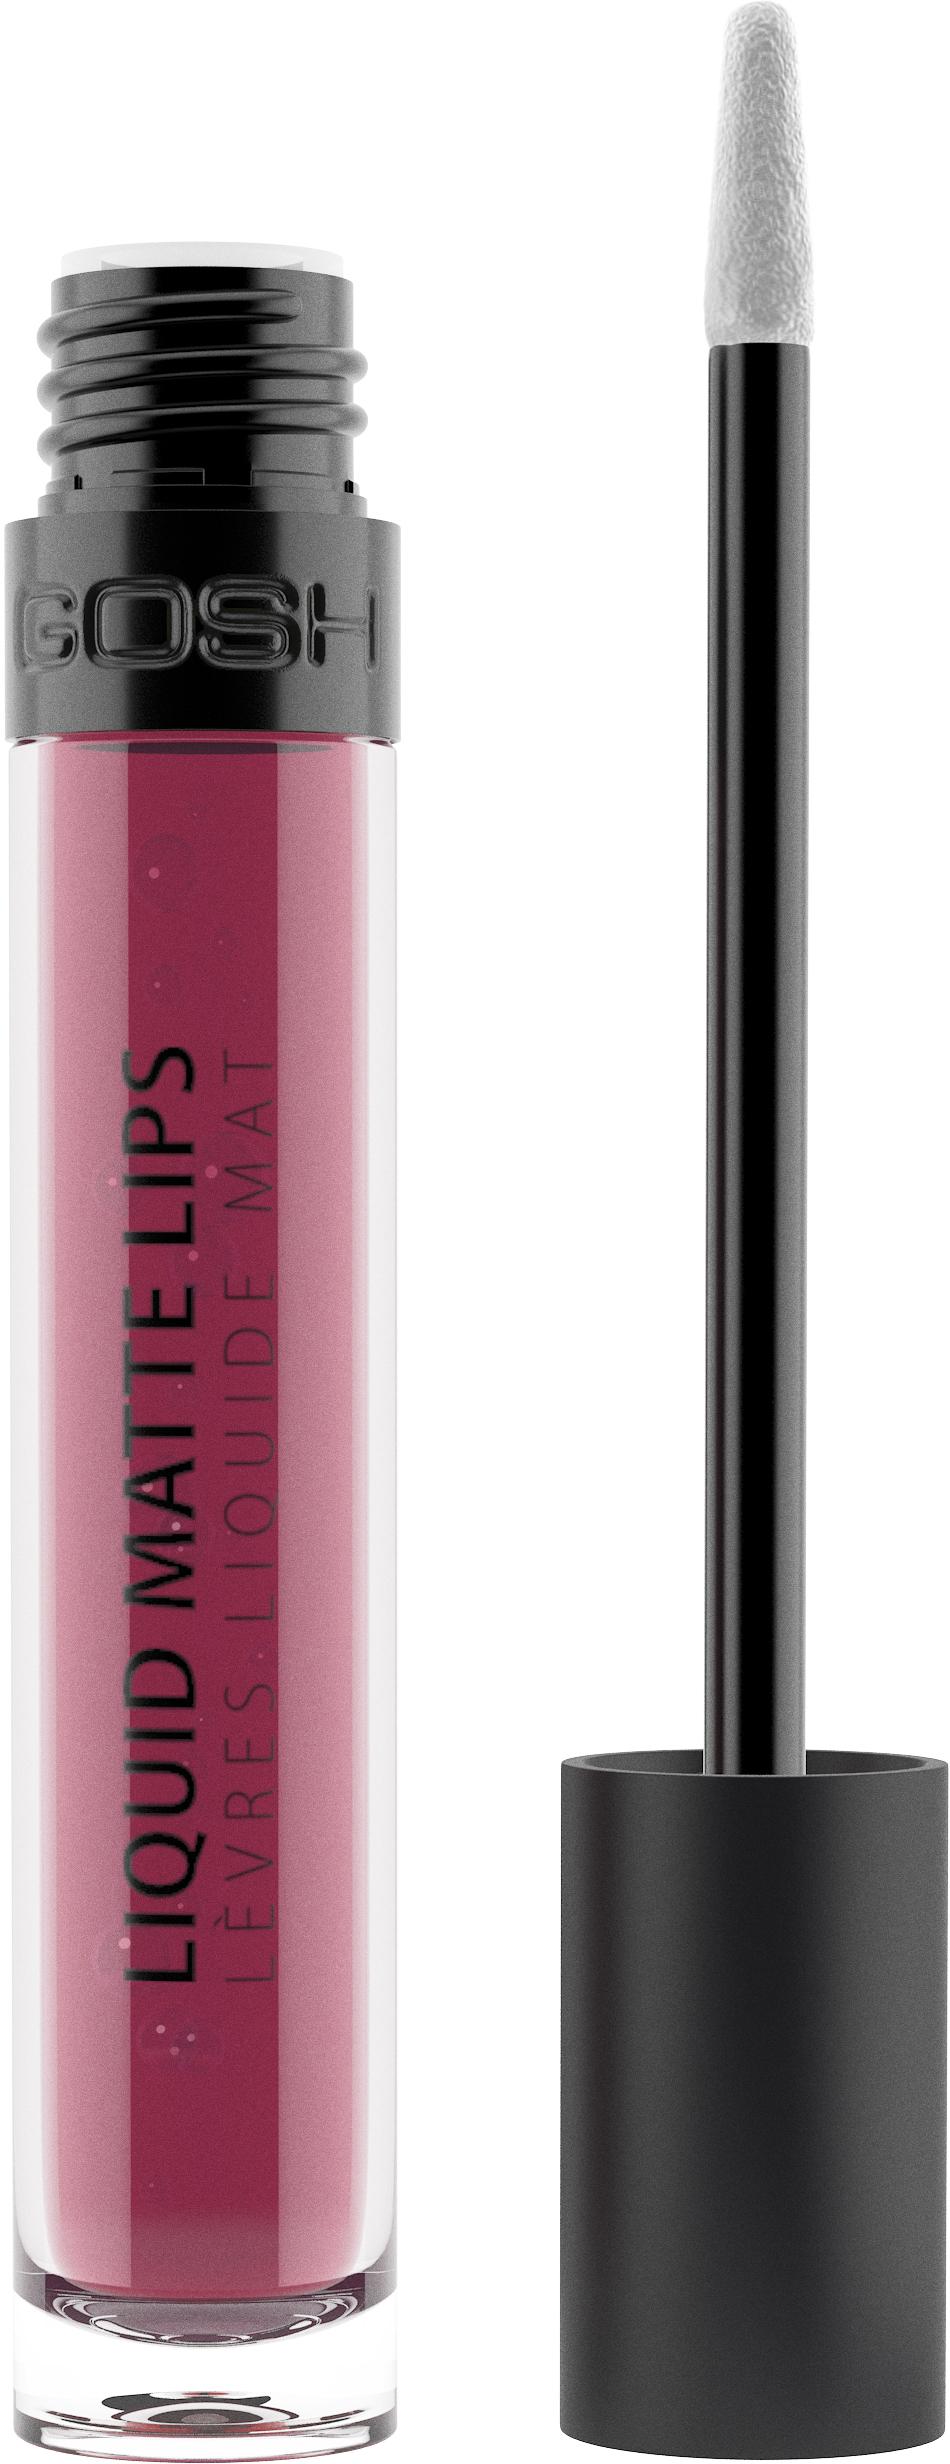 Liquid Matte Lips N02 open.jpg